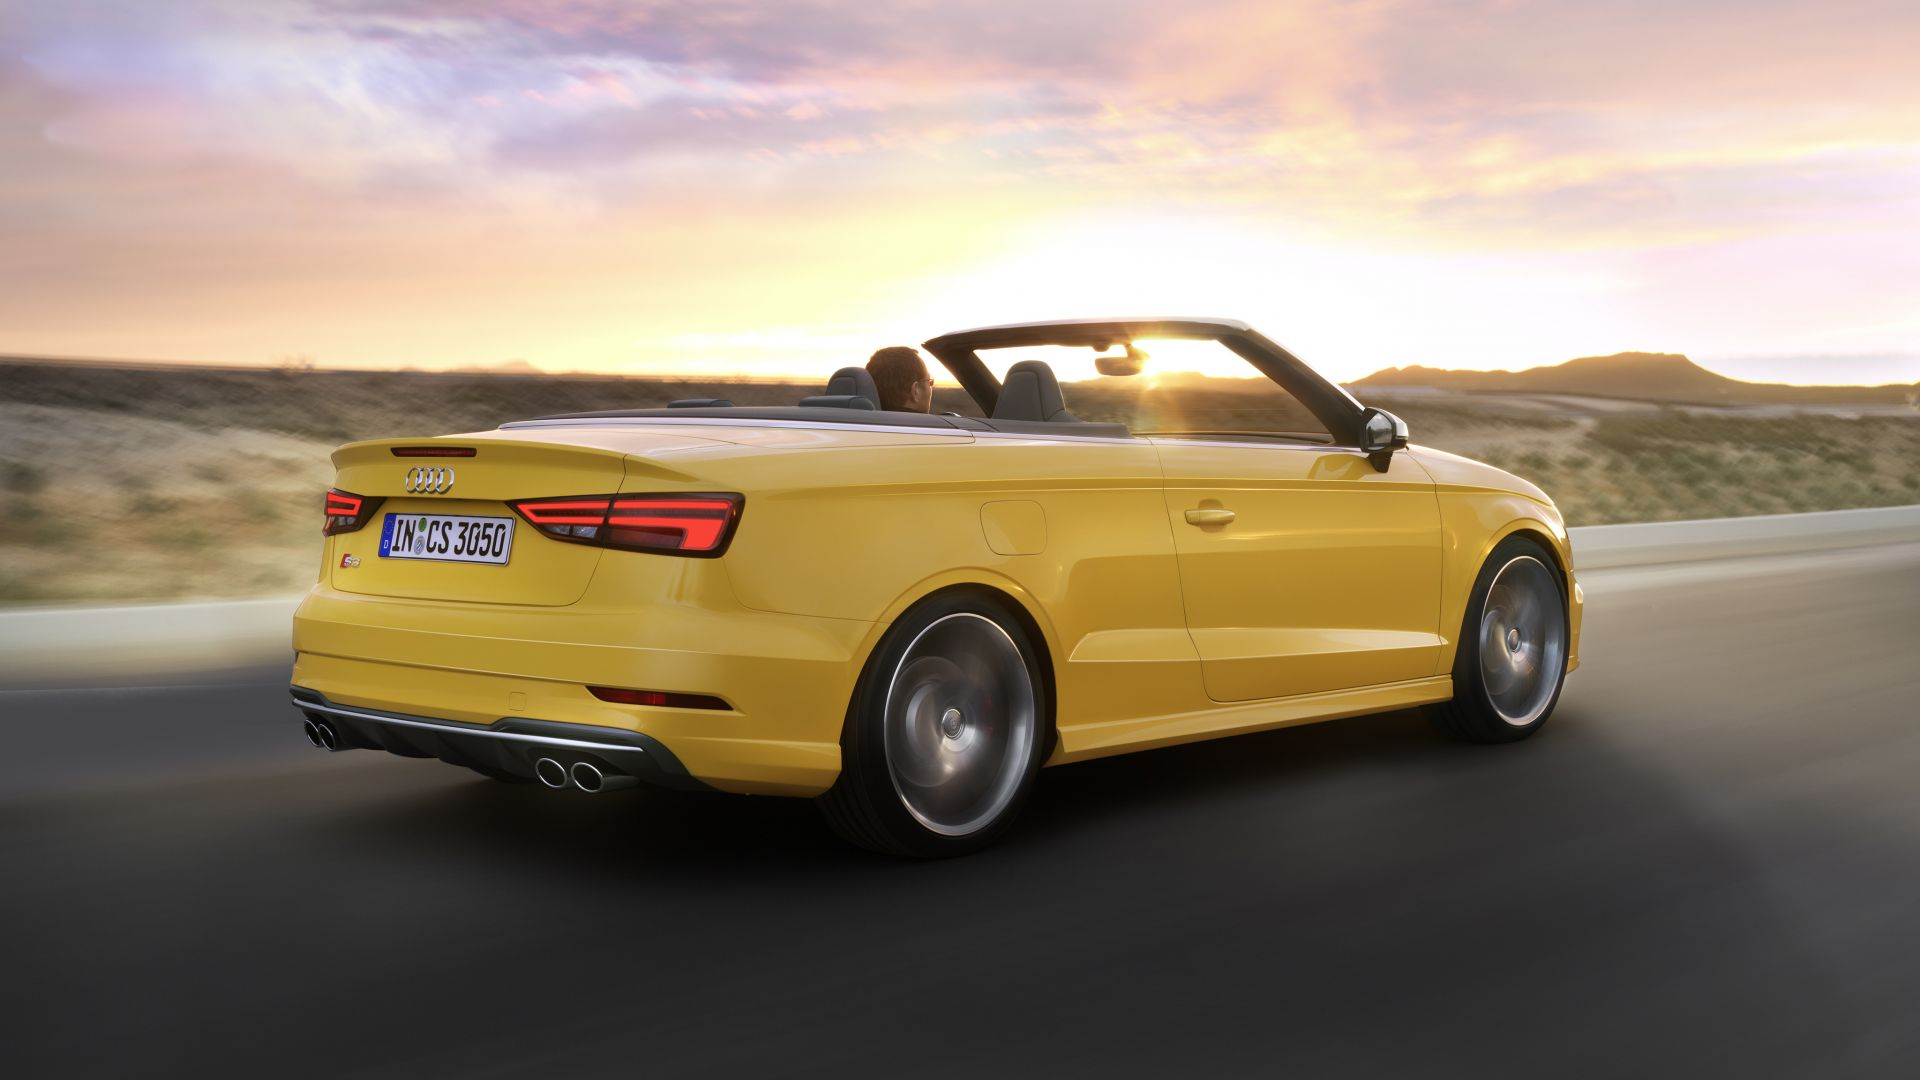 wallpaper audi s3 cabriolet yellow cars bikes 10263. Black Bedroom Furniture Sets. Home Design Ideas